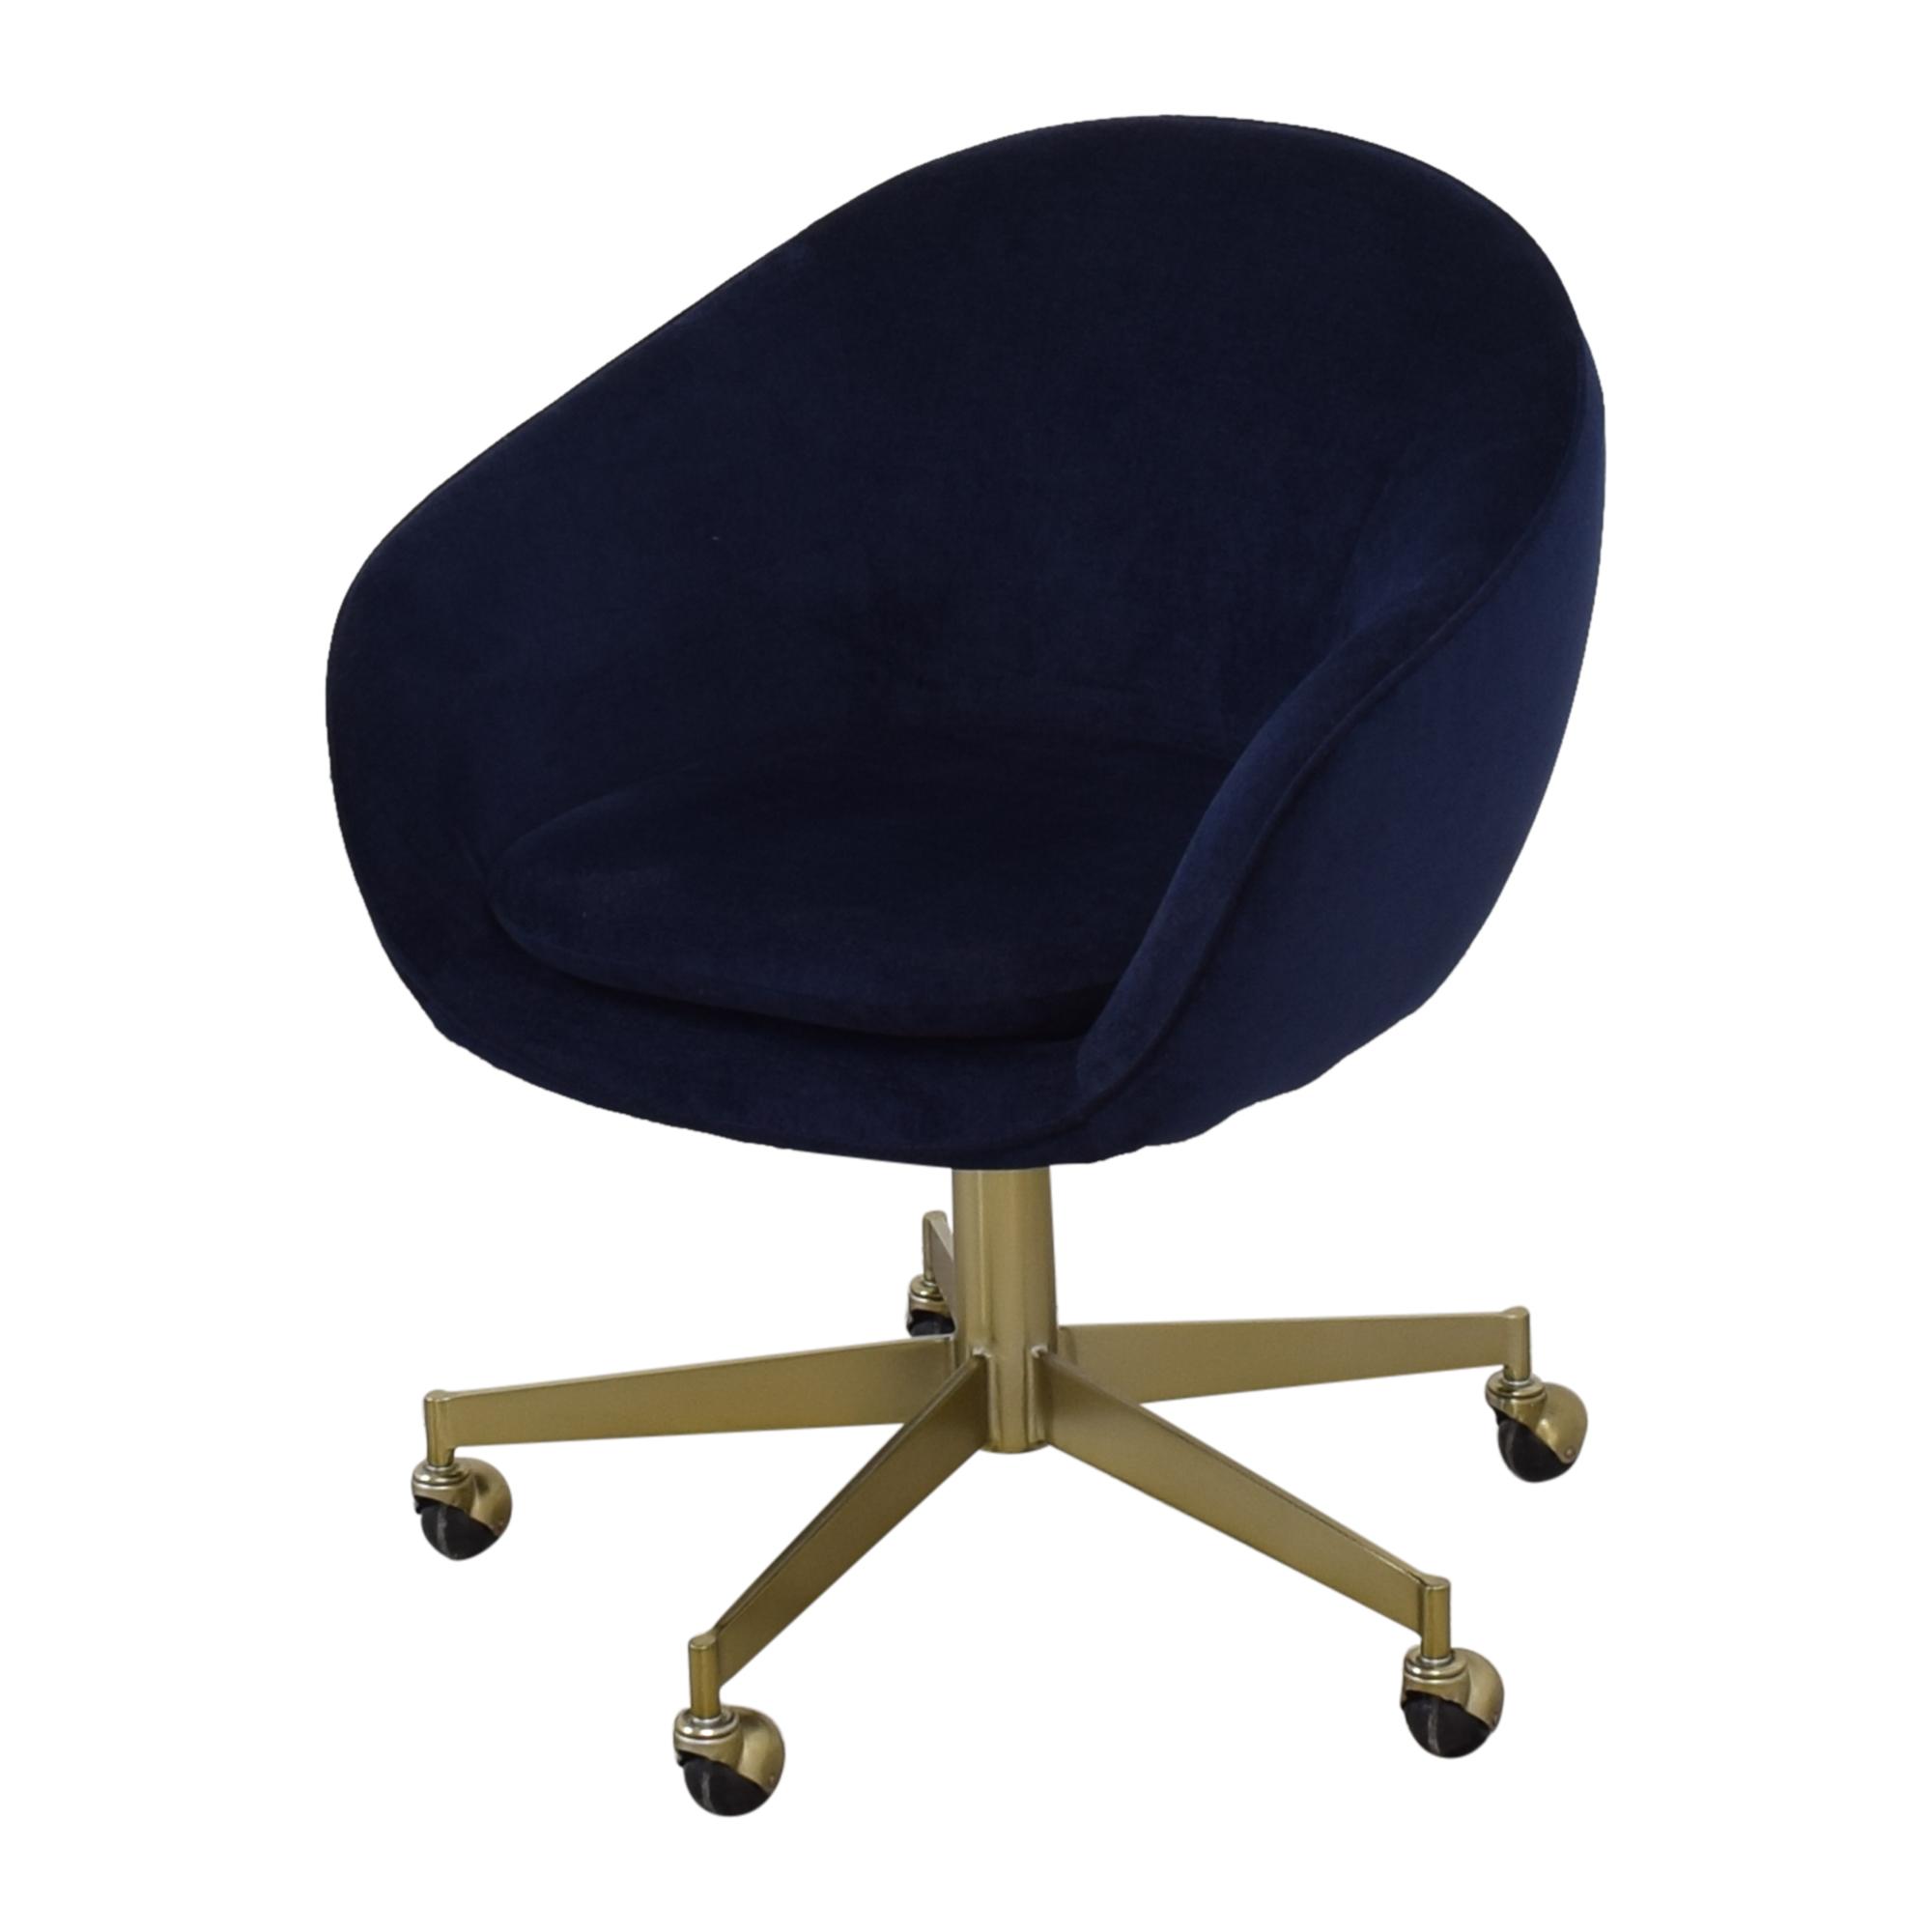 West Elm Alys Swivel Office Chair sale